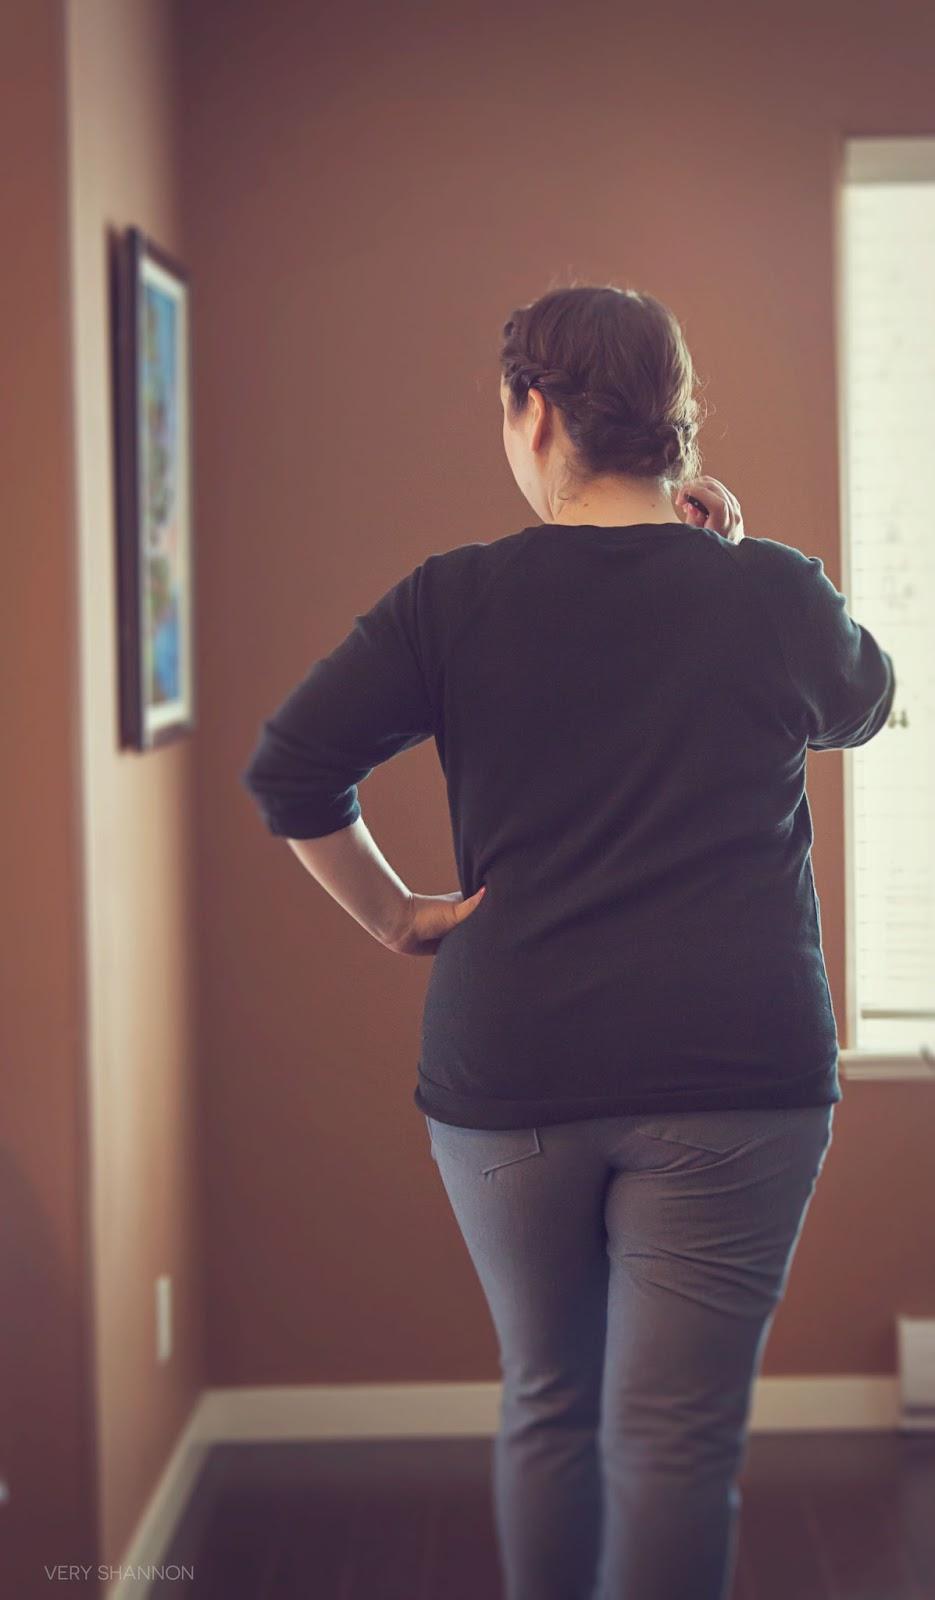 Jocole Ladies Skinny Pants Pattern Review | VeryShannon.com #sewing #pants